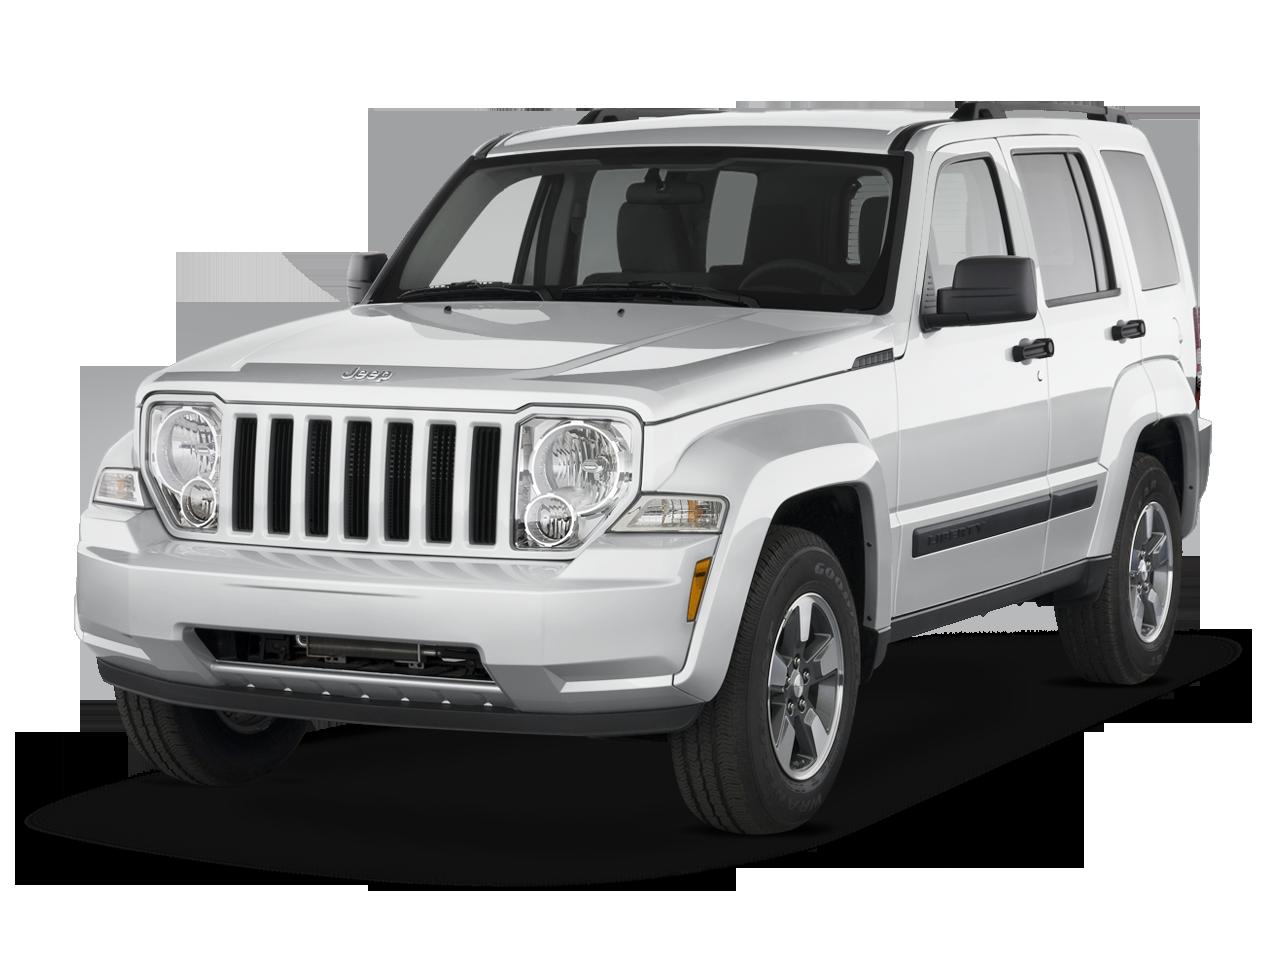 Jeep Liberty (Patriot) 2006 - 2016 SUV 5 door #3